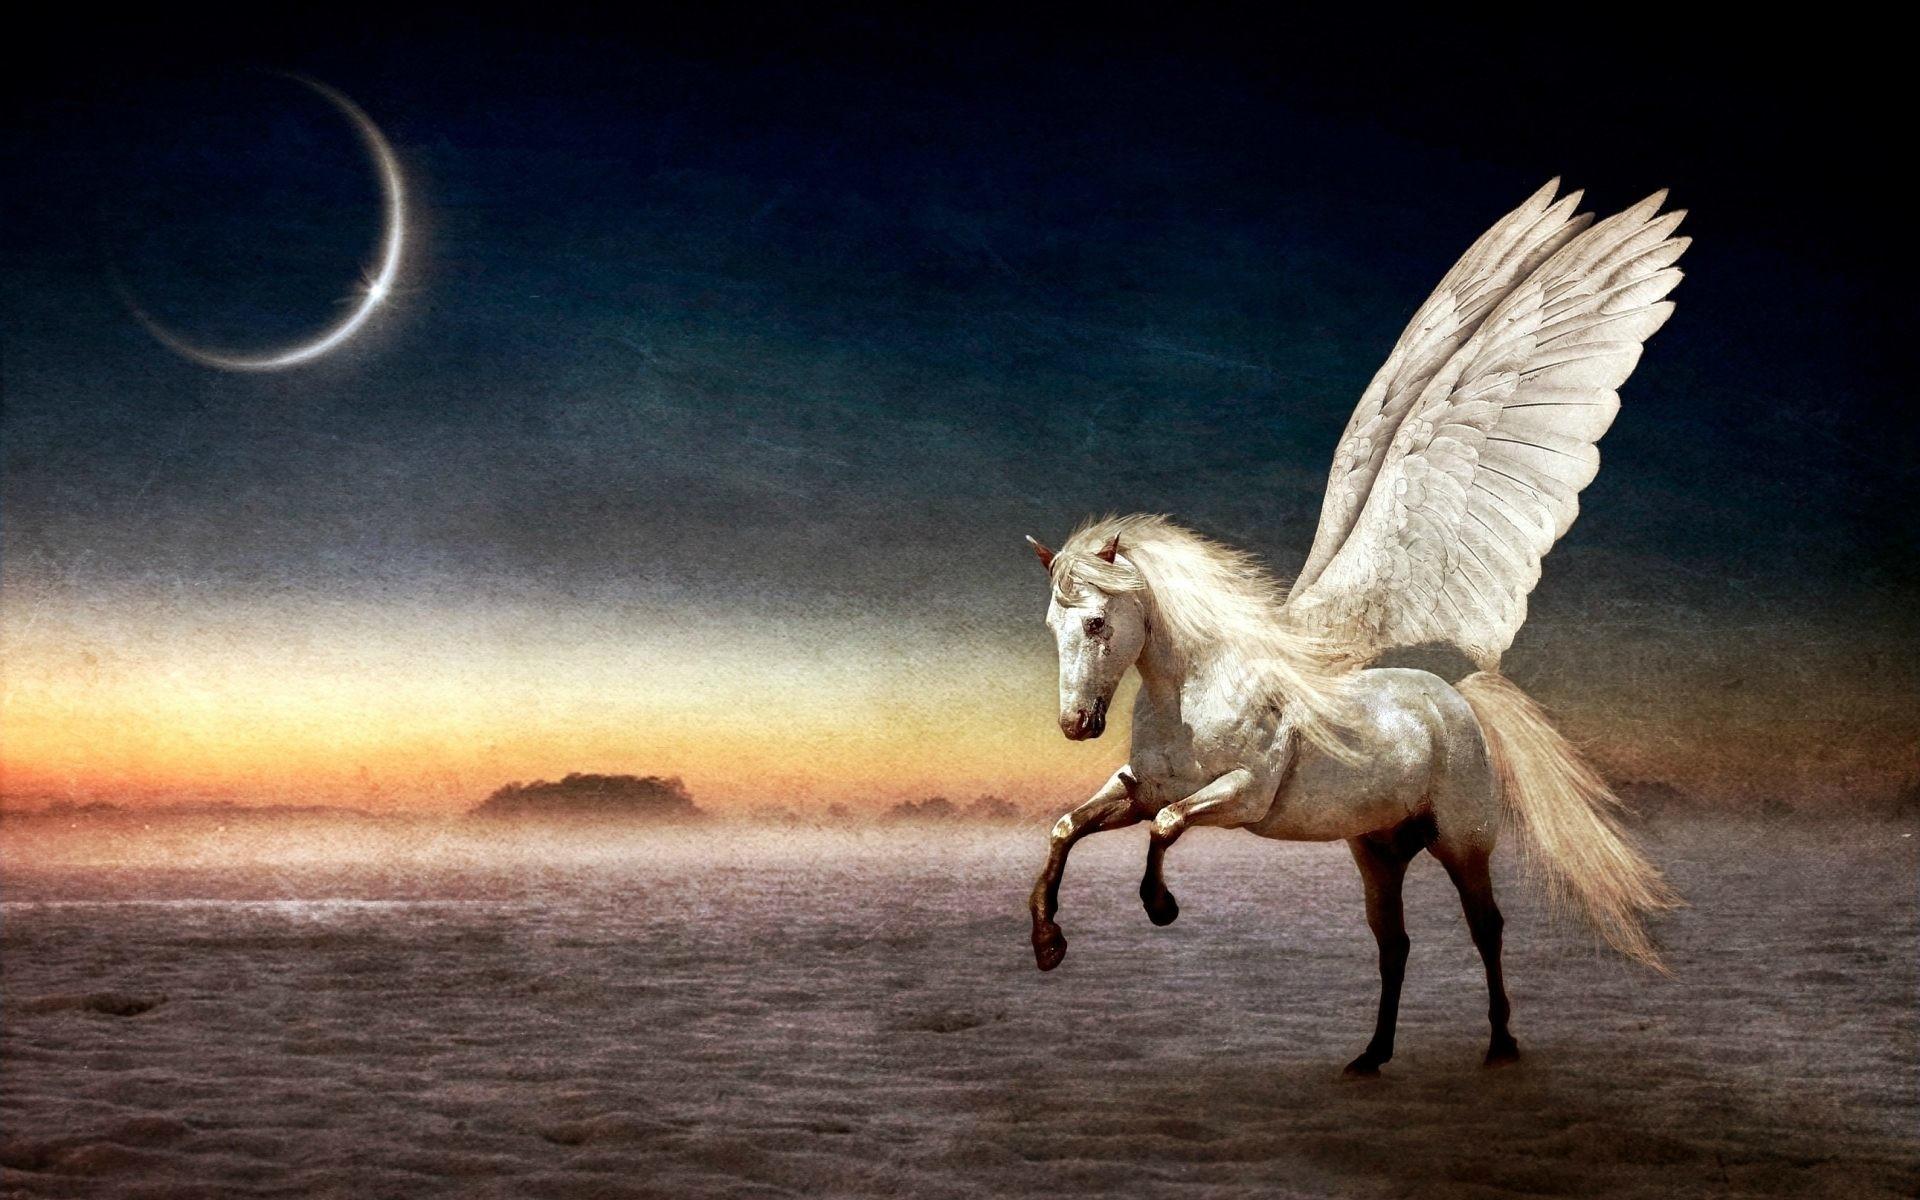 Fire Horse Wallpaper HD (61+ images)